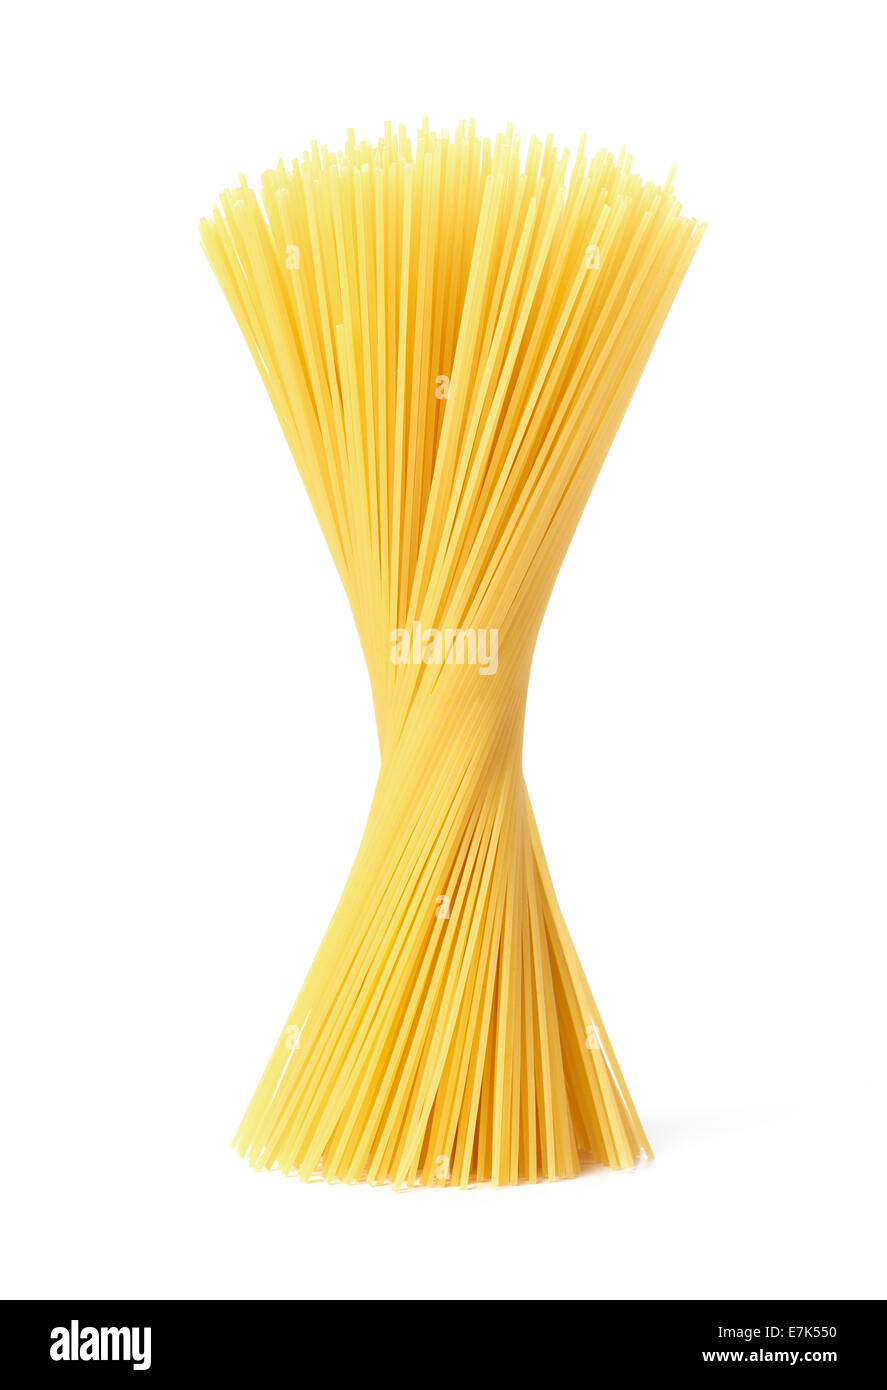 Isolated Spaghetti Pasta - Stock Image